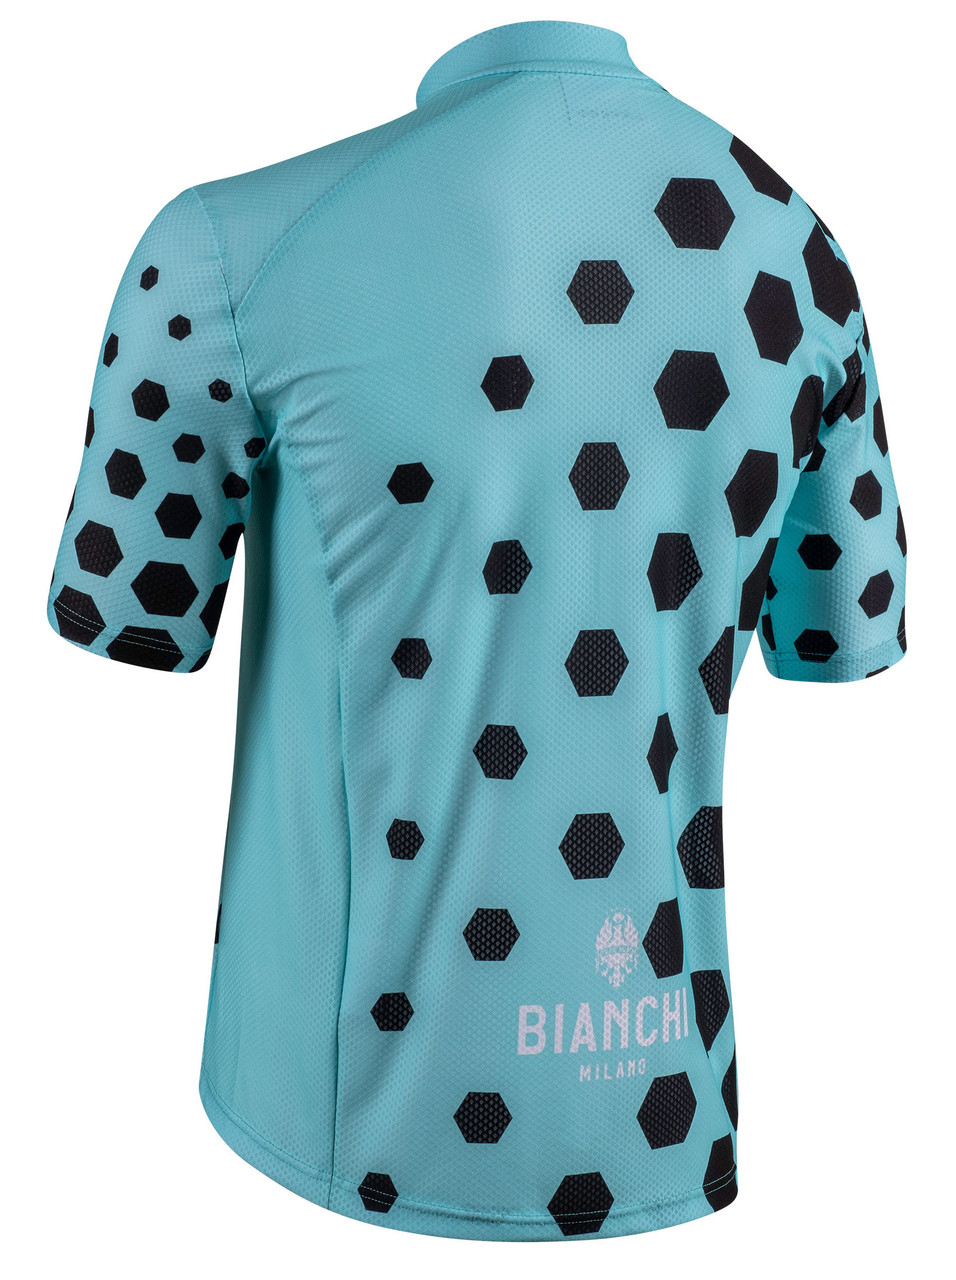 Bianchi Milano Cohingas Black Green Jersey Rear